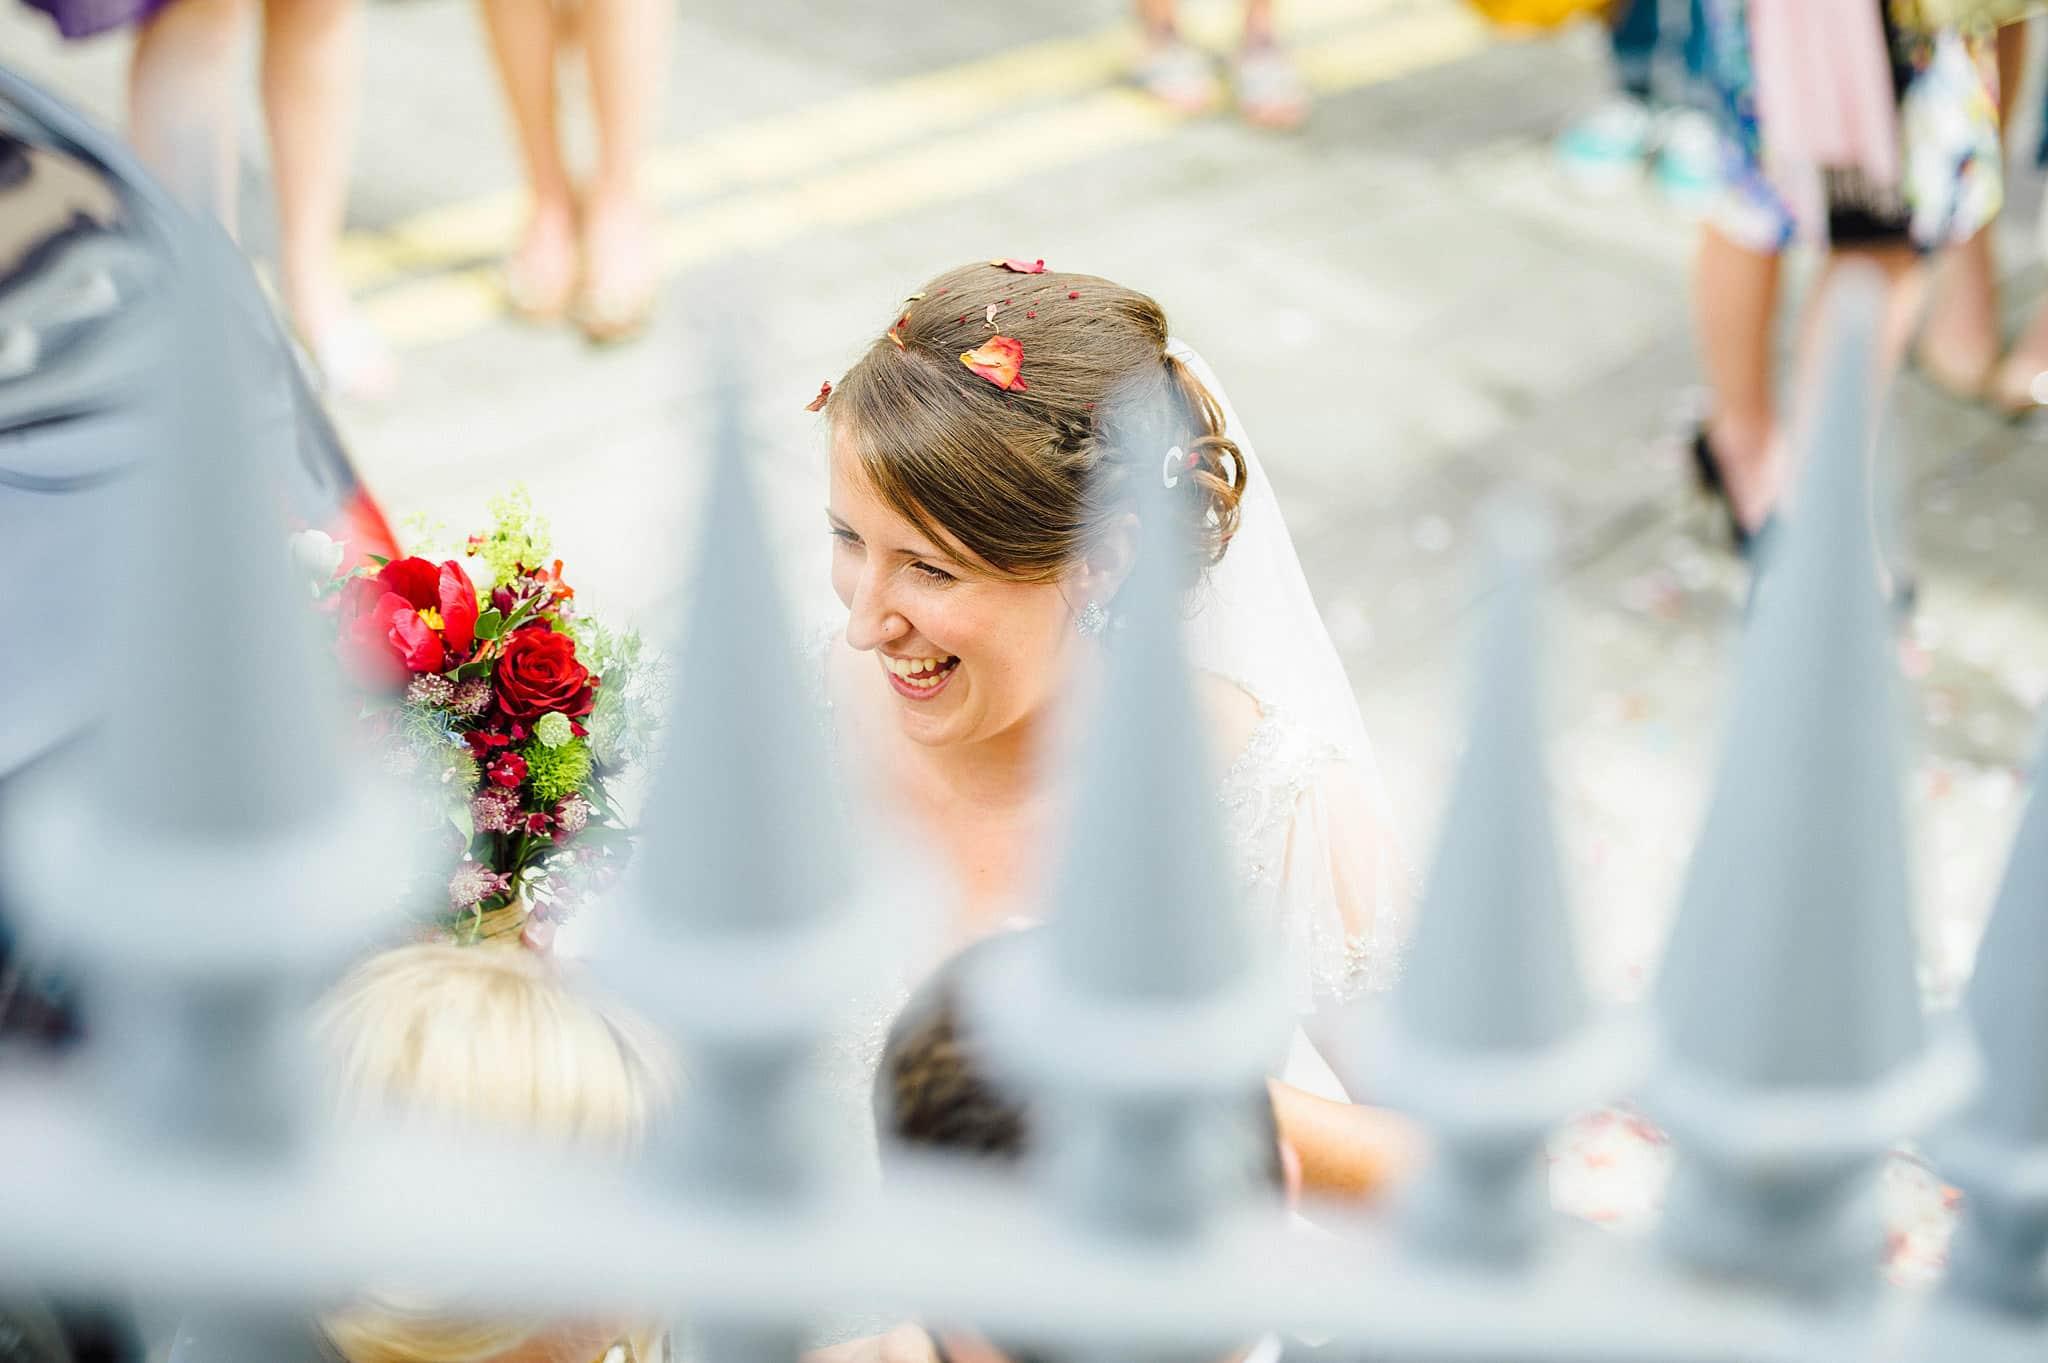 wedding-photographer-aberystwyth-wales (89)